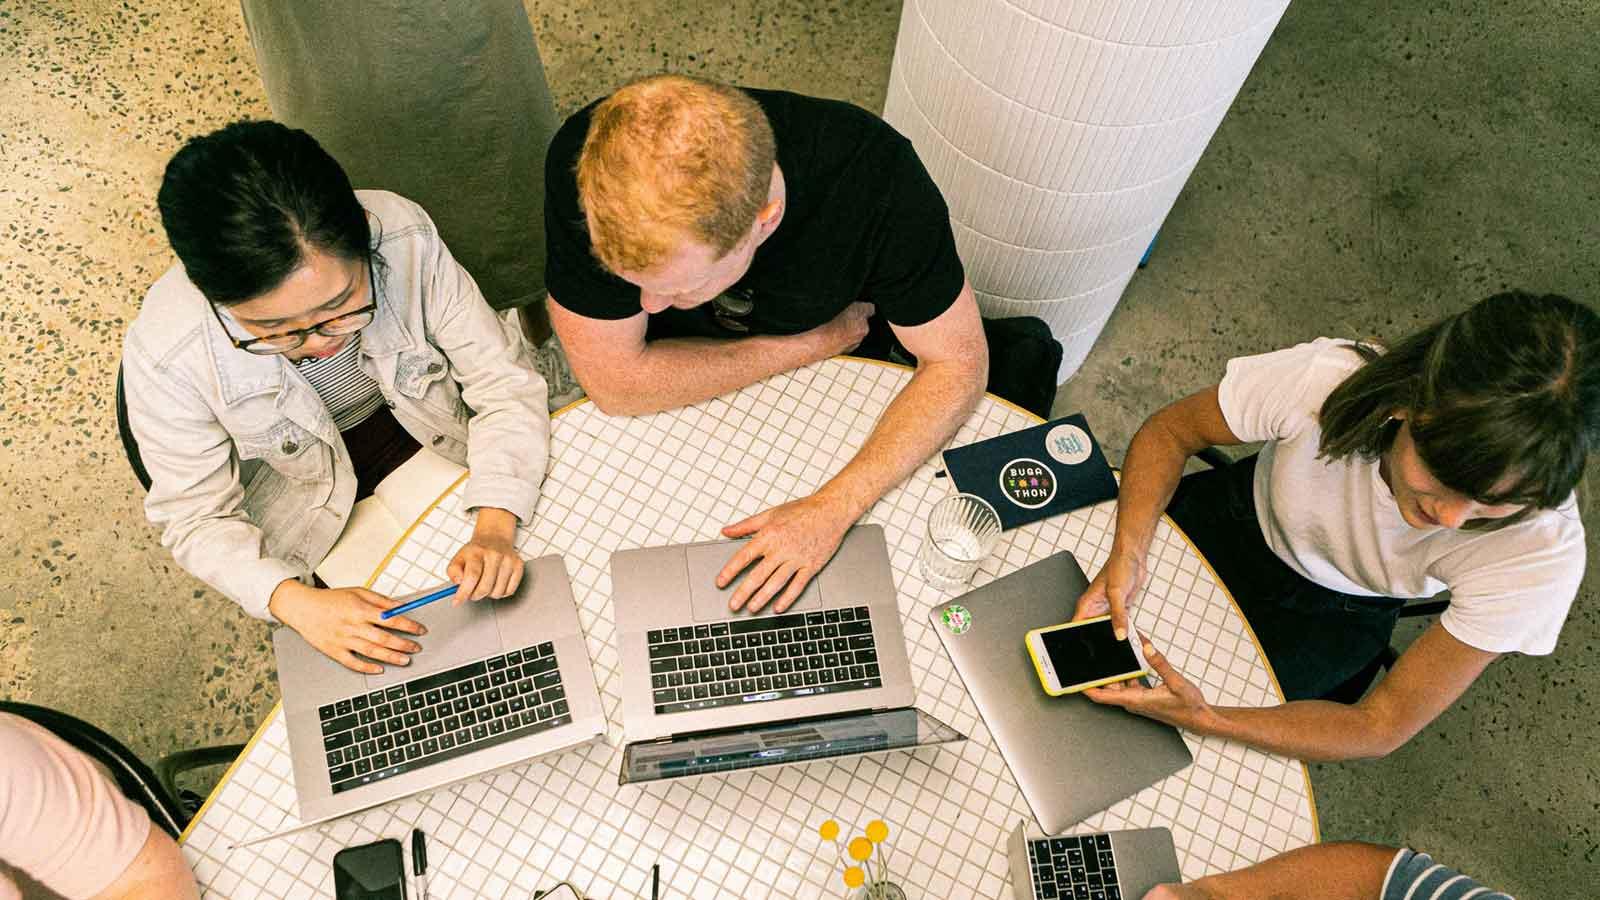 IMT Premier Google Partner